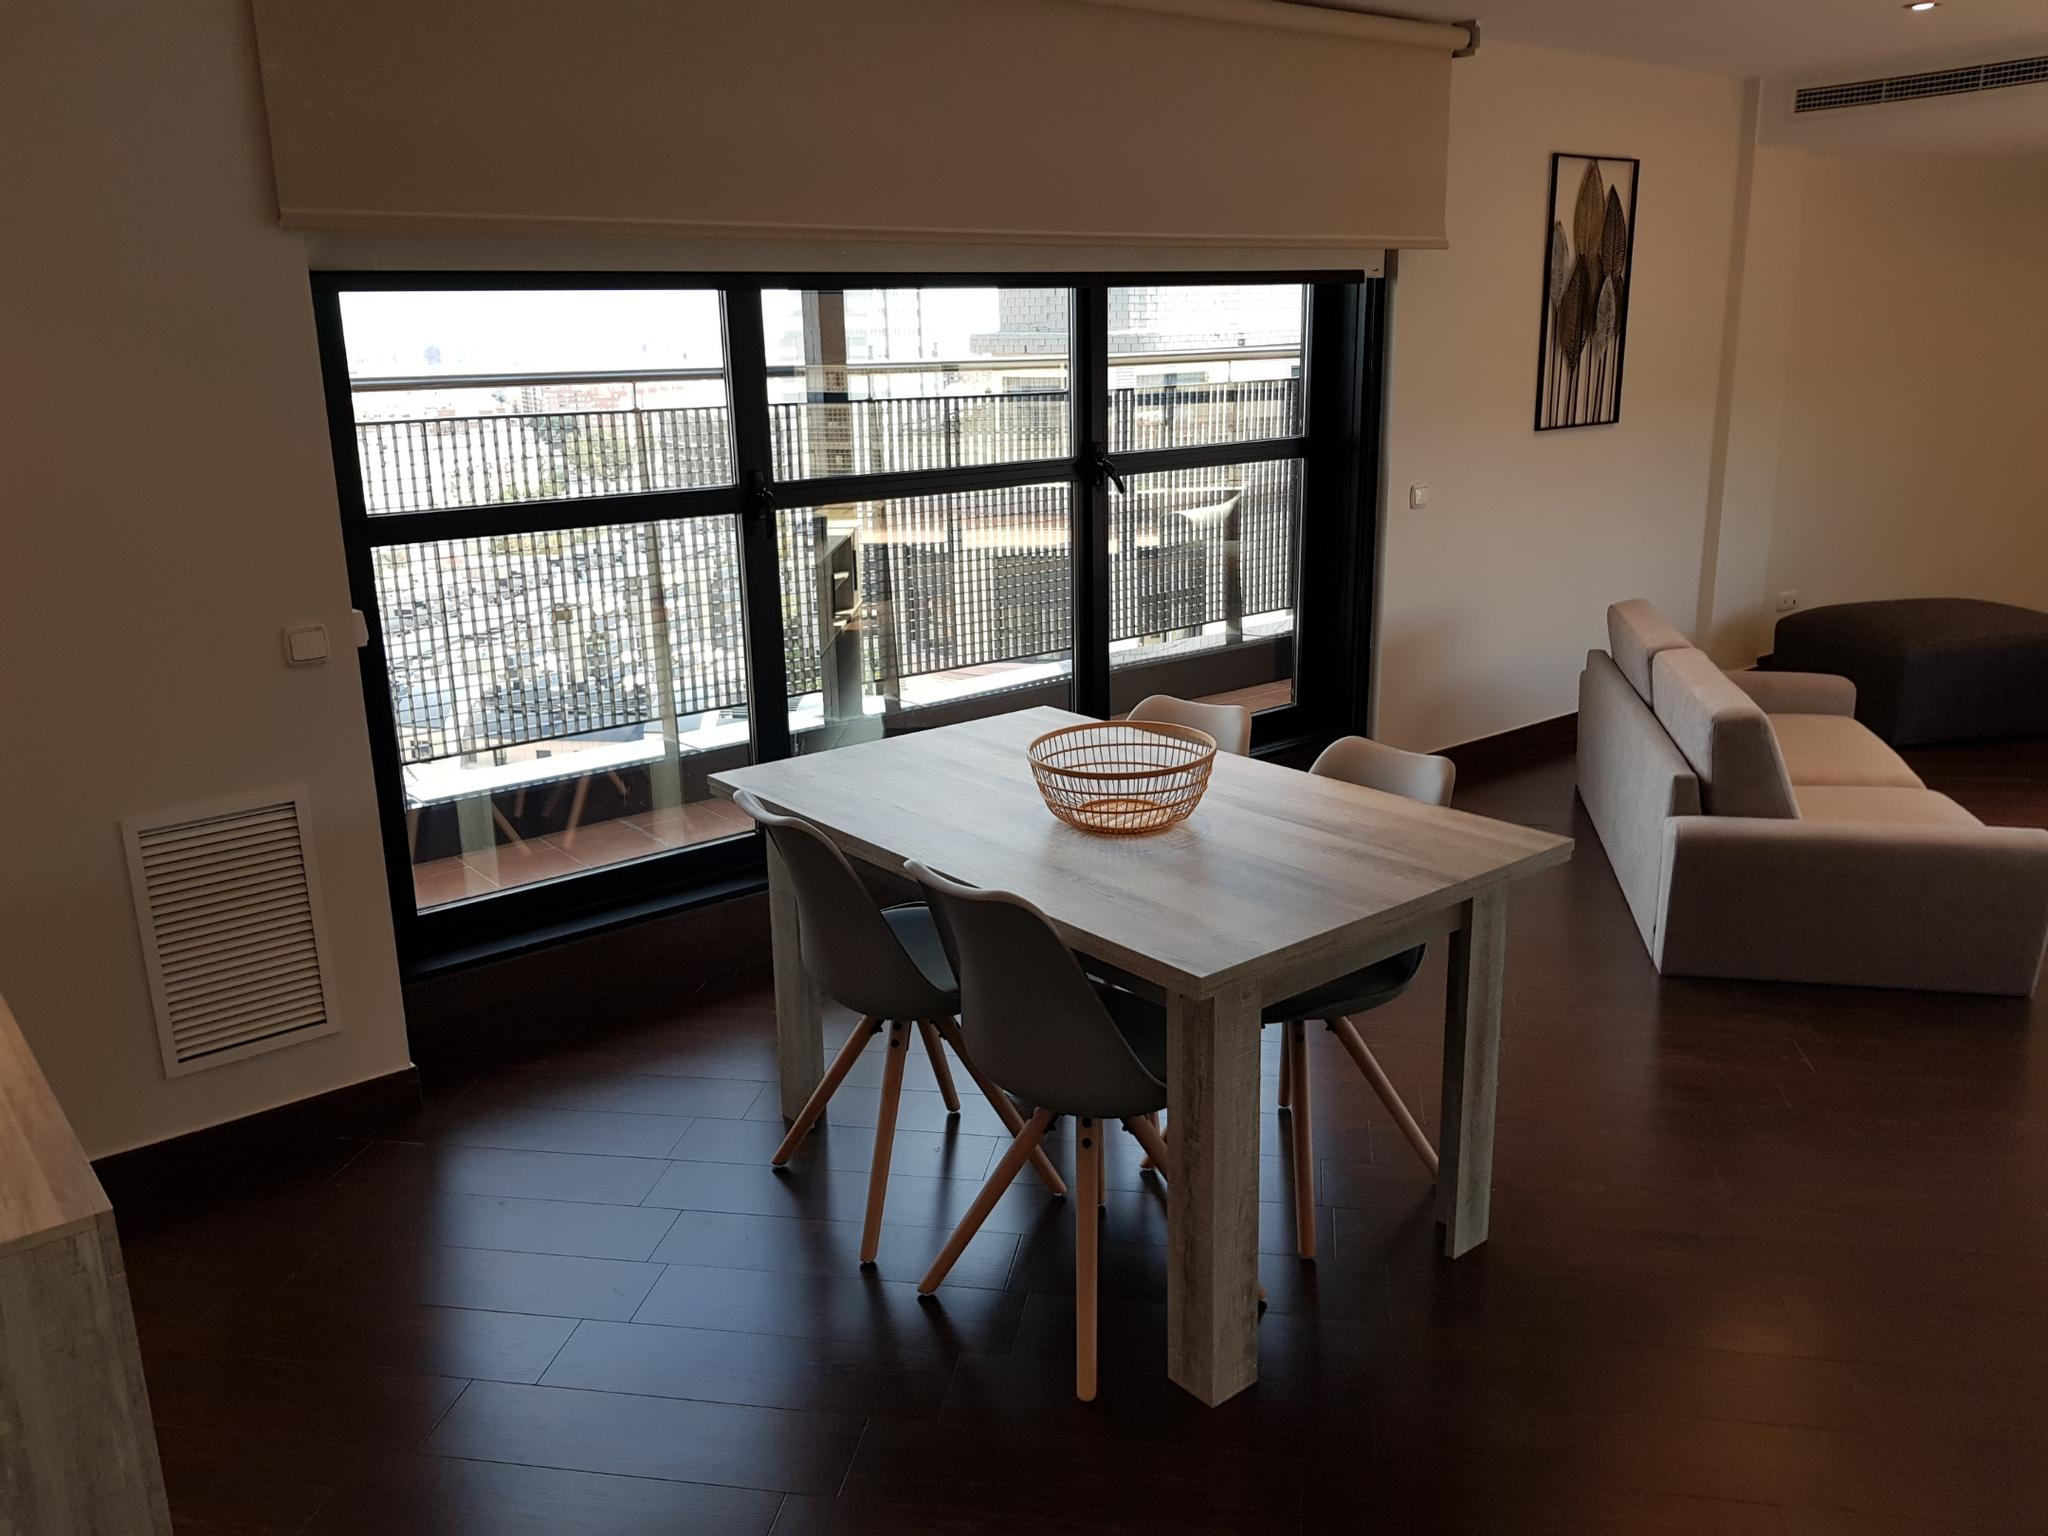 Las Cortes - Exclusive expat apartment in Valencia